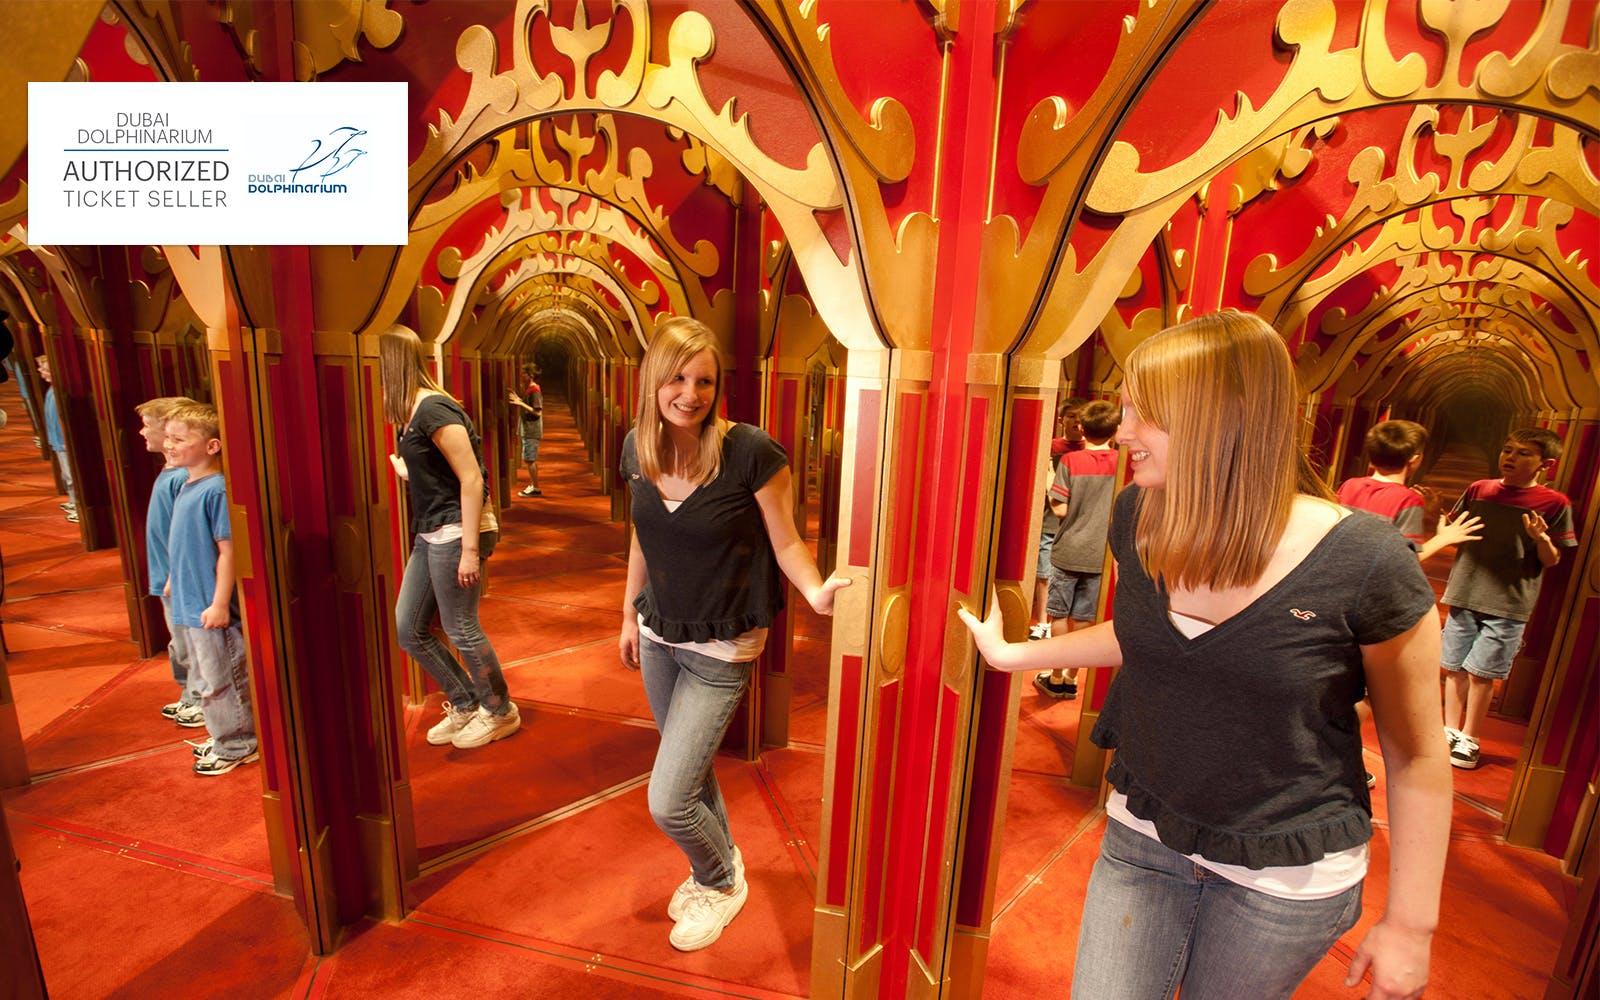 dubai-dolphinarium-mirror-maze